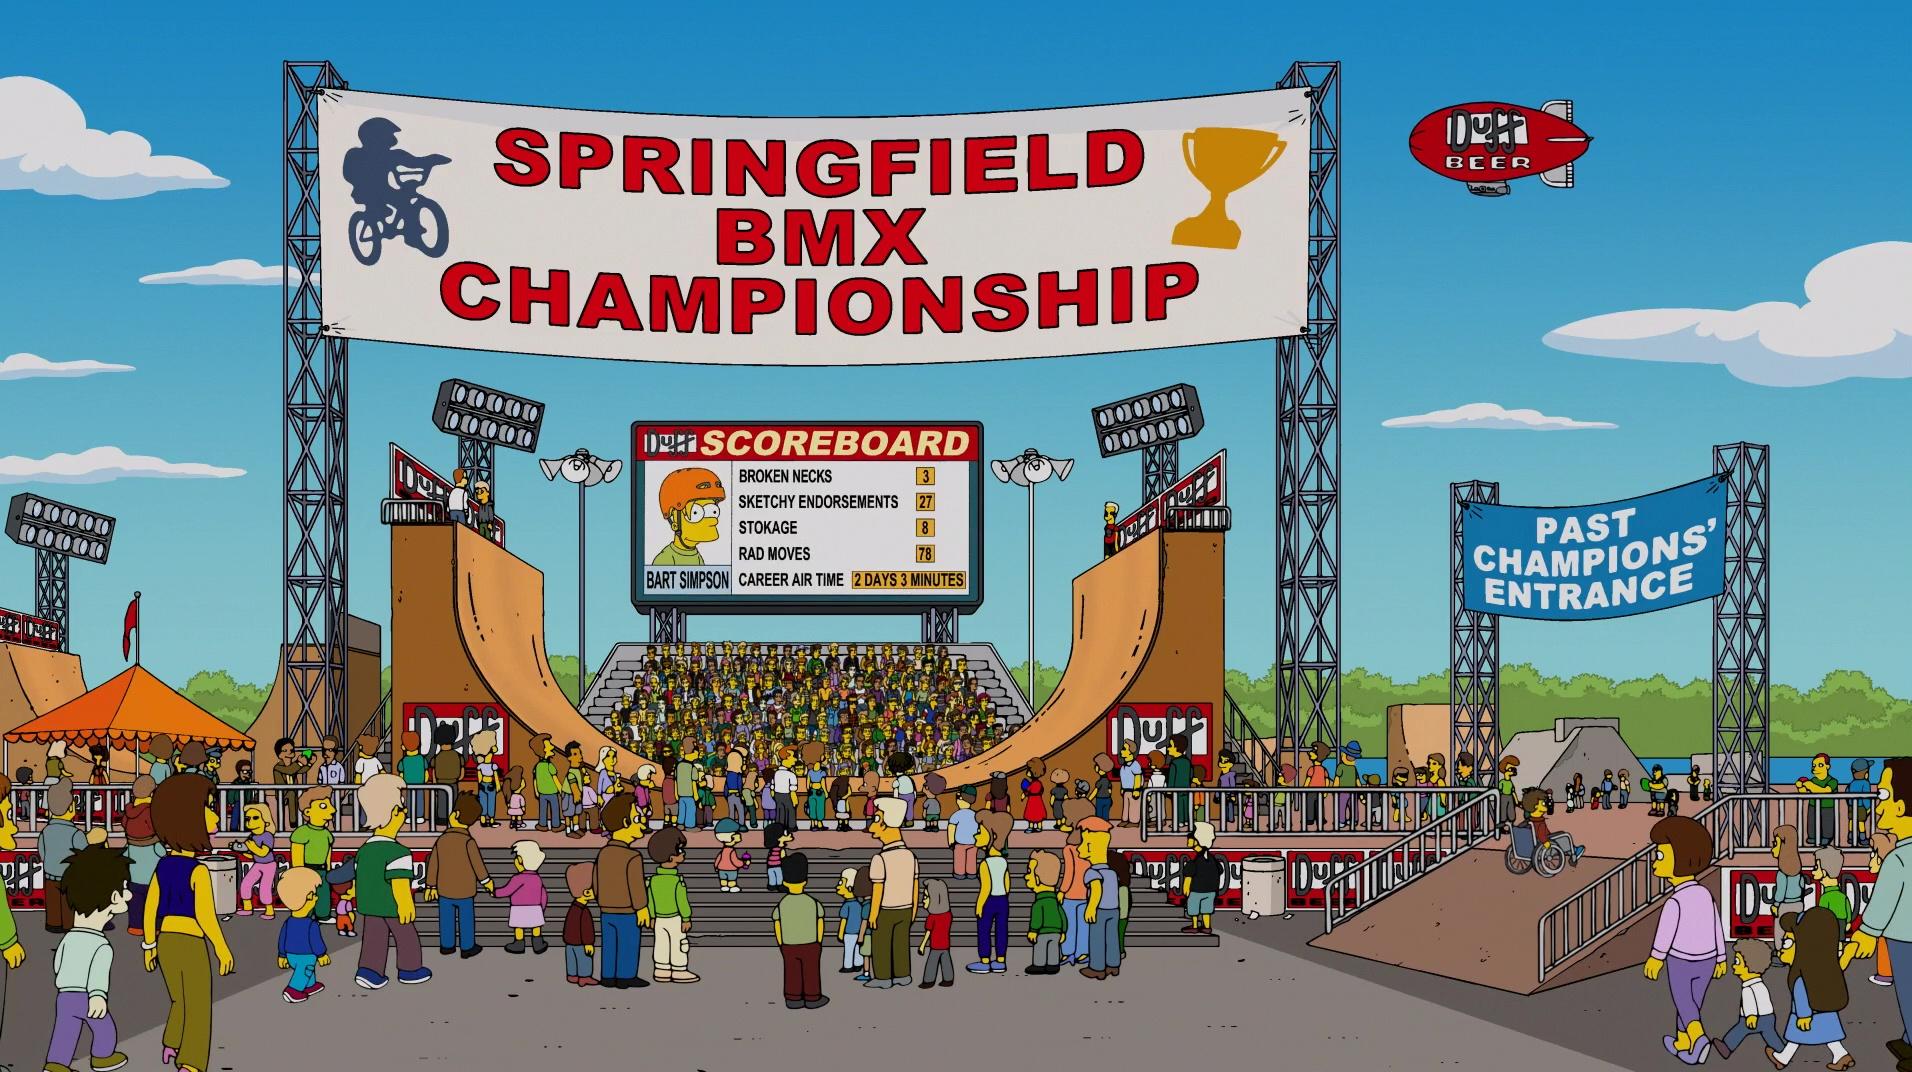 Springfield BMX Championship